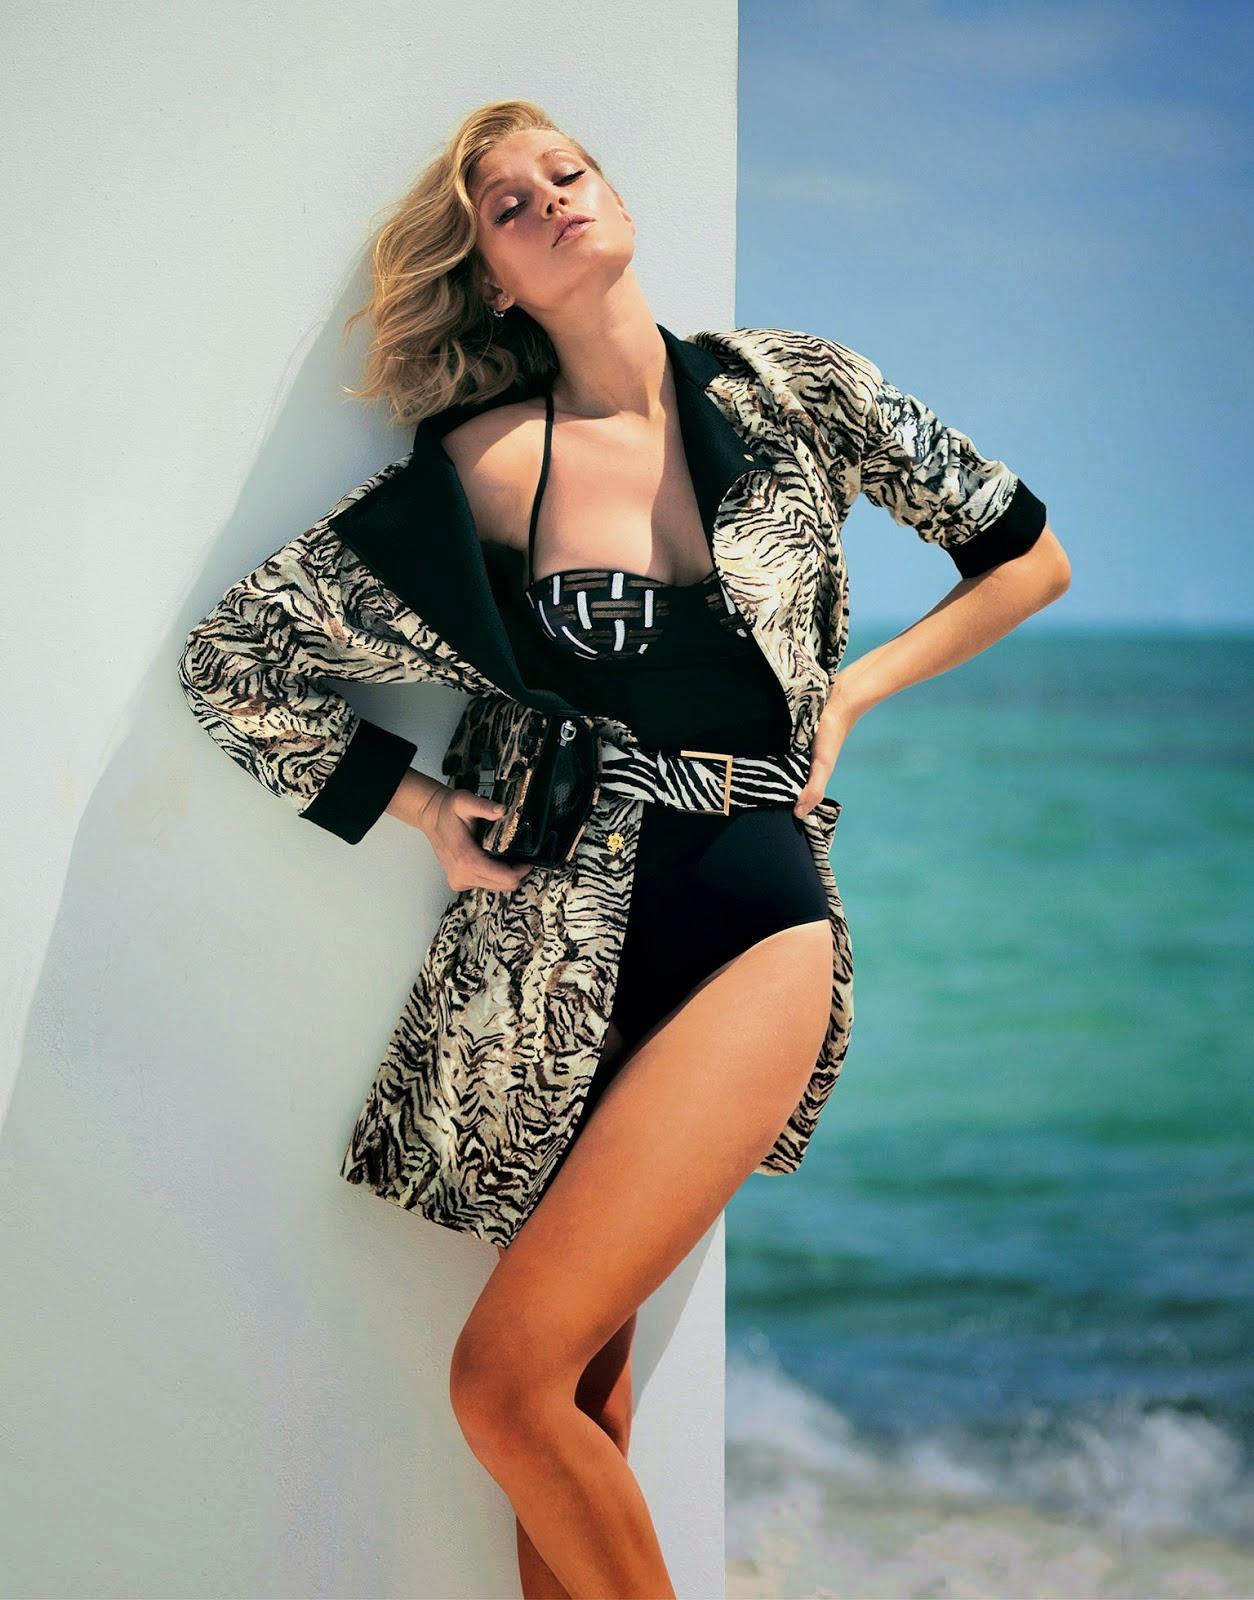 Cleavage Toni Garrn naked (63 photos), Ass, Bikini, Boobs, braless 2020